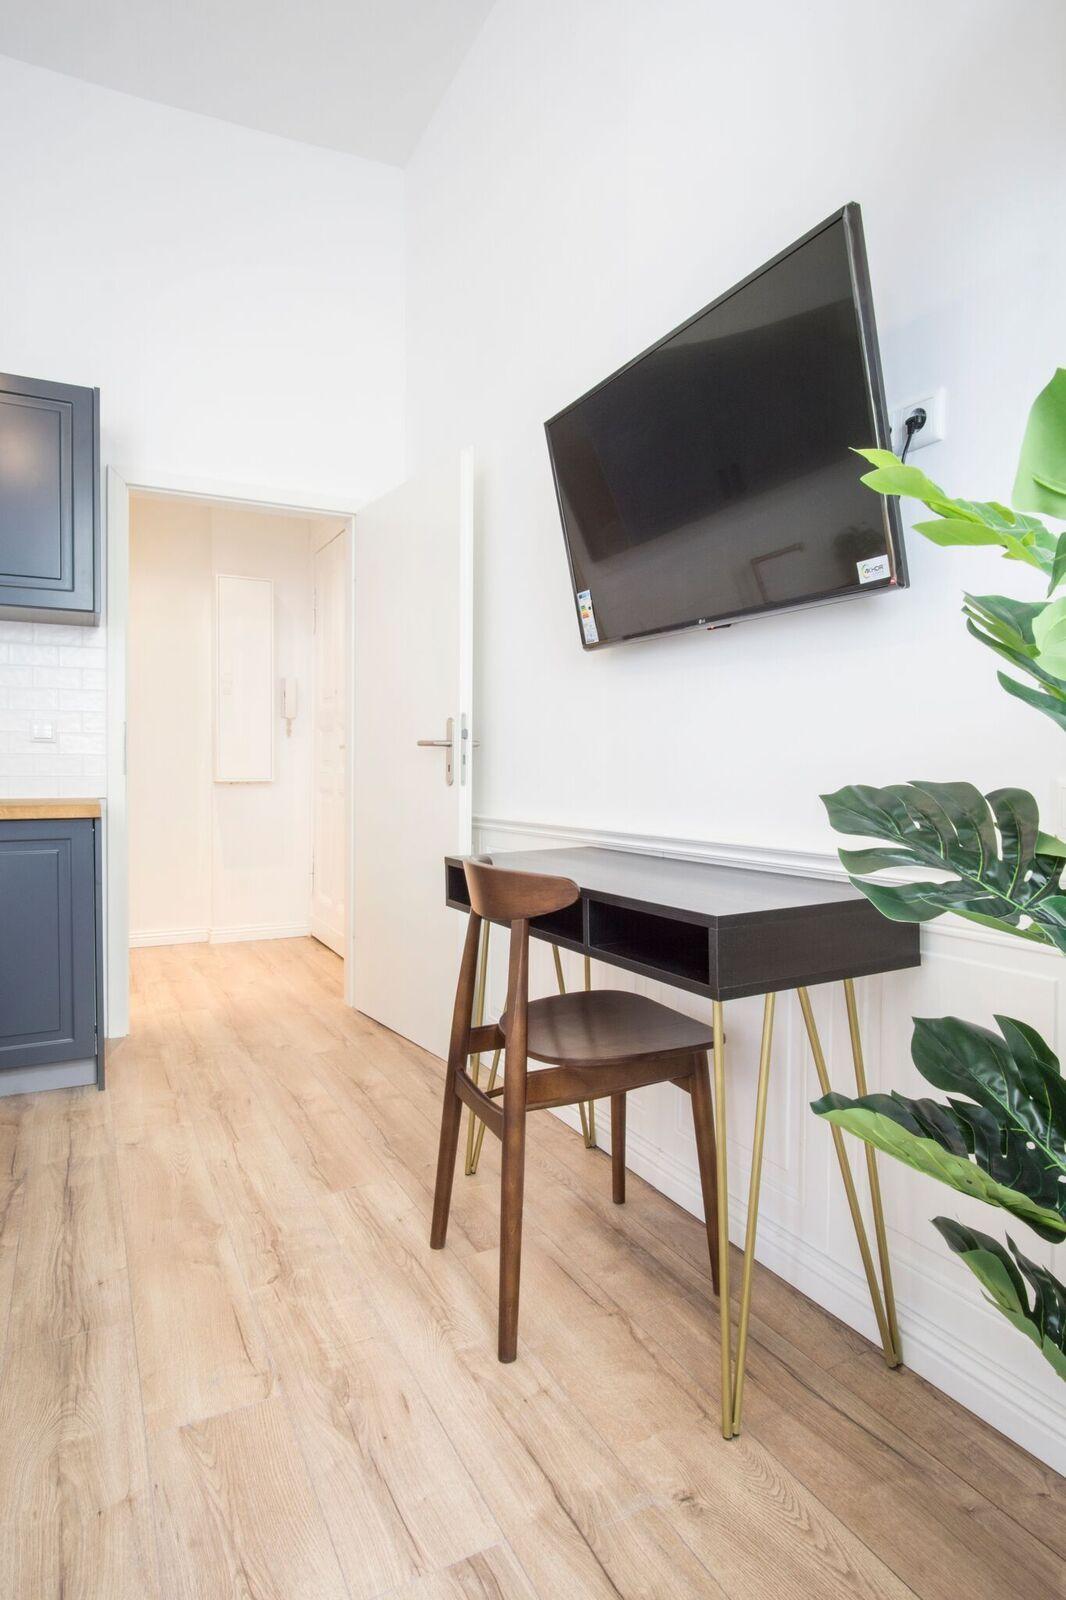 Studio apartment to rent in Berlin RUEC-RUEC-0003-0